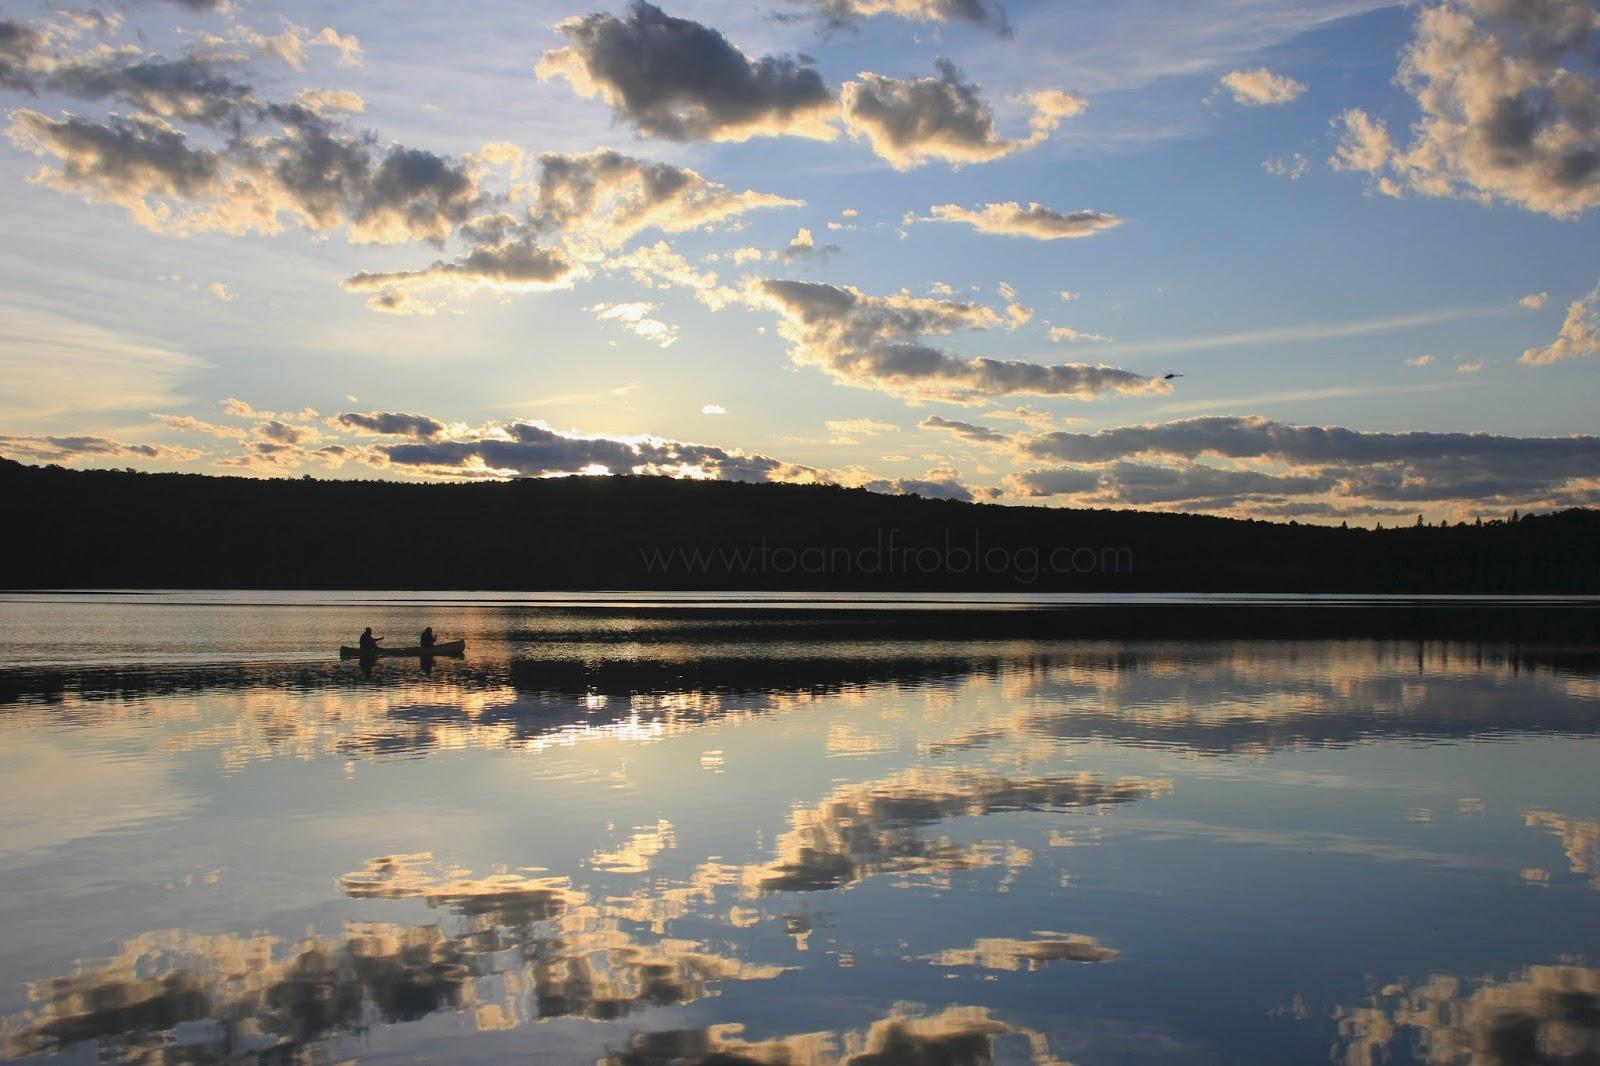 algonquin provincial park, ontario canada sunset